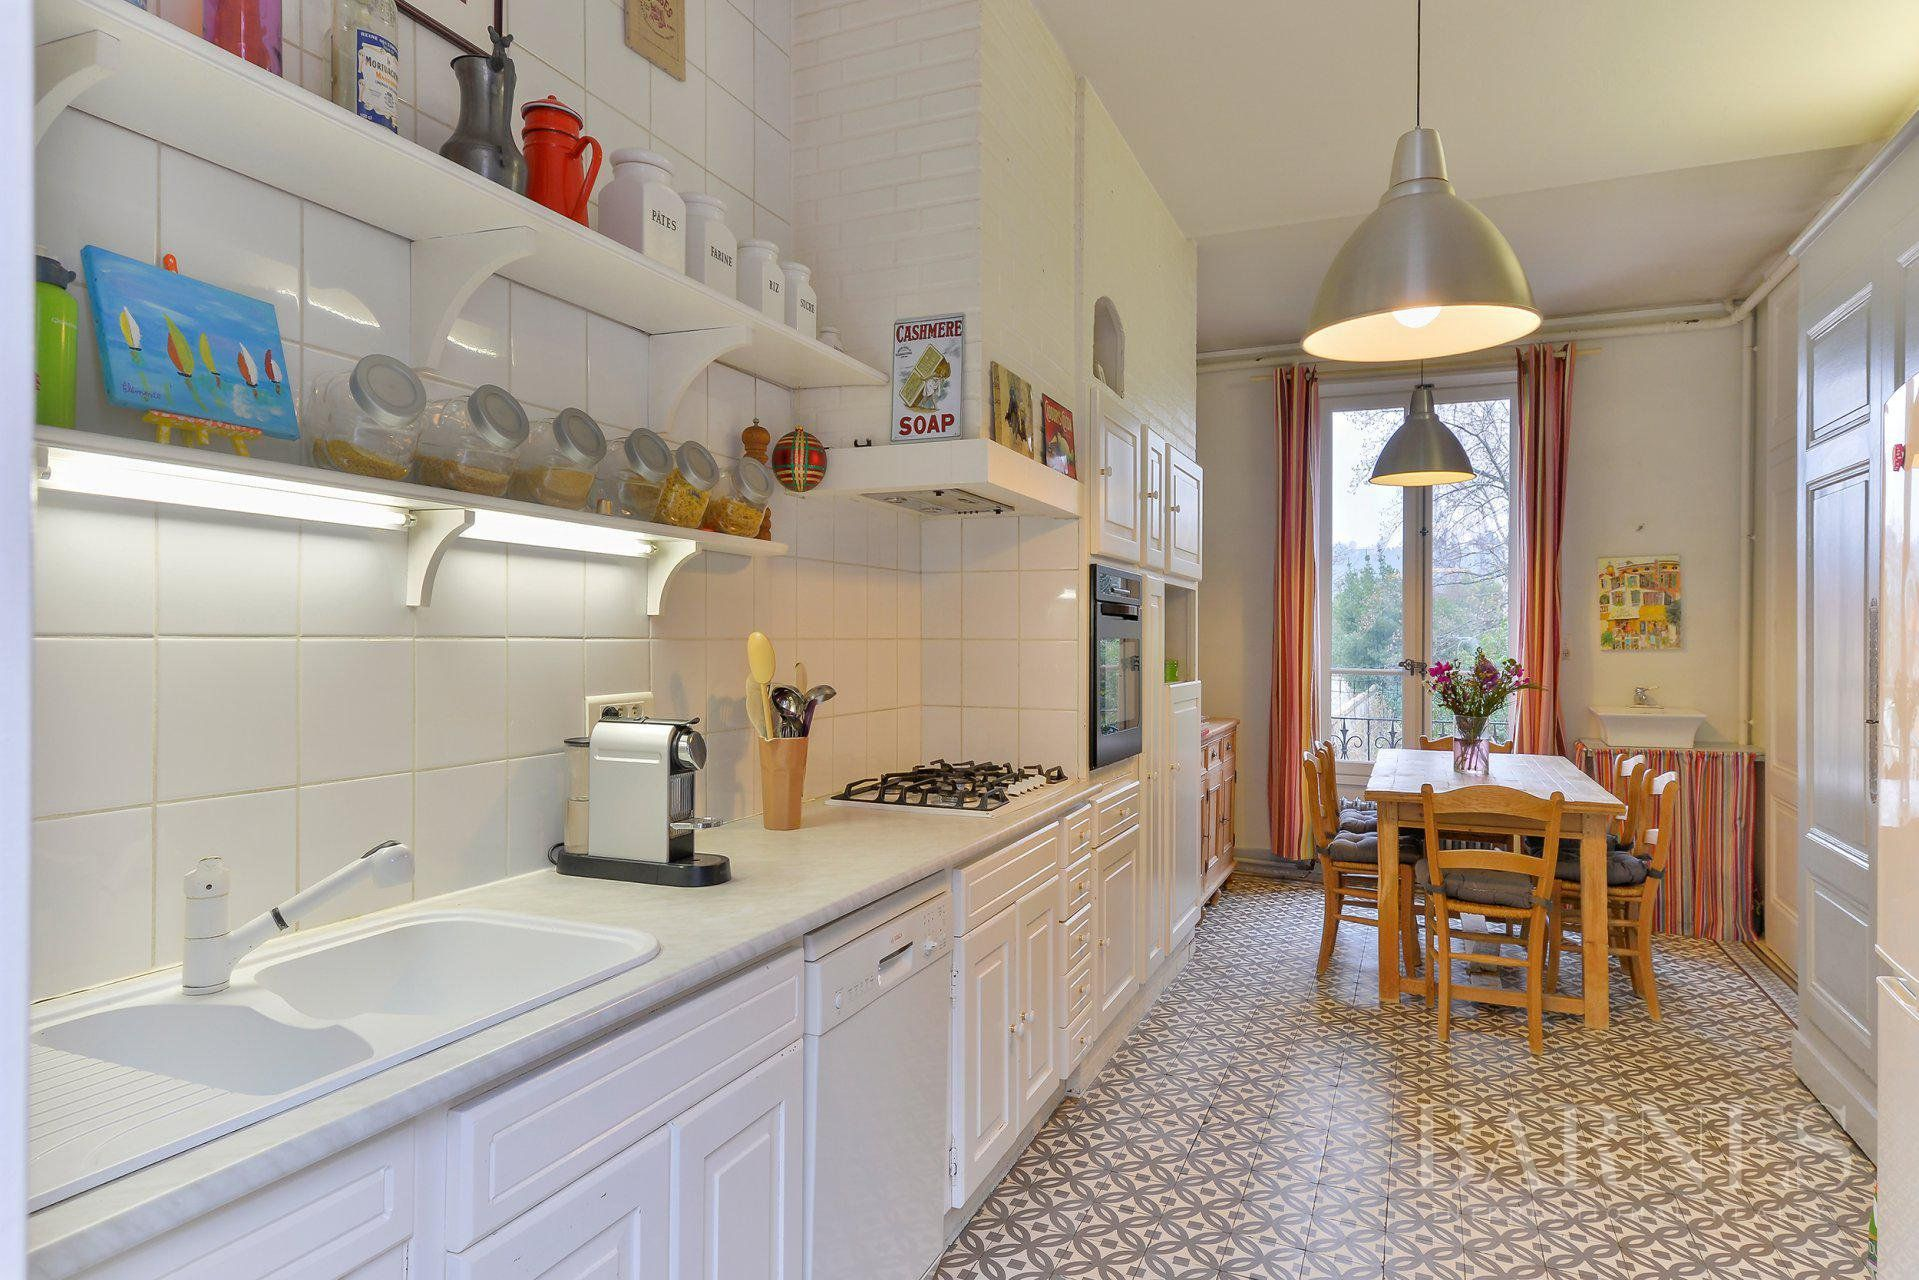 Collonges-au-Mont-d'Or - Property of 500 sqm - Land of 3880 sqm - 6 bedrooms